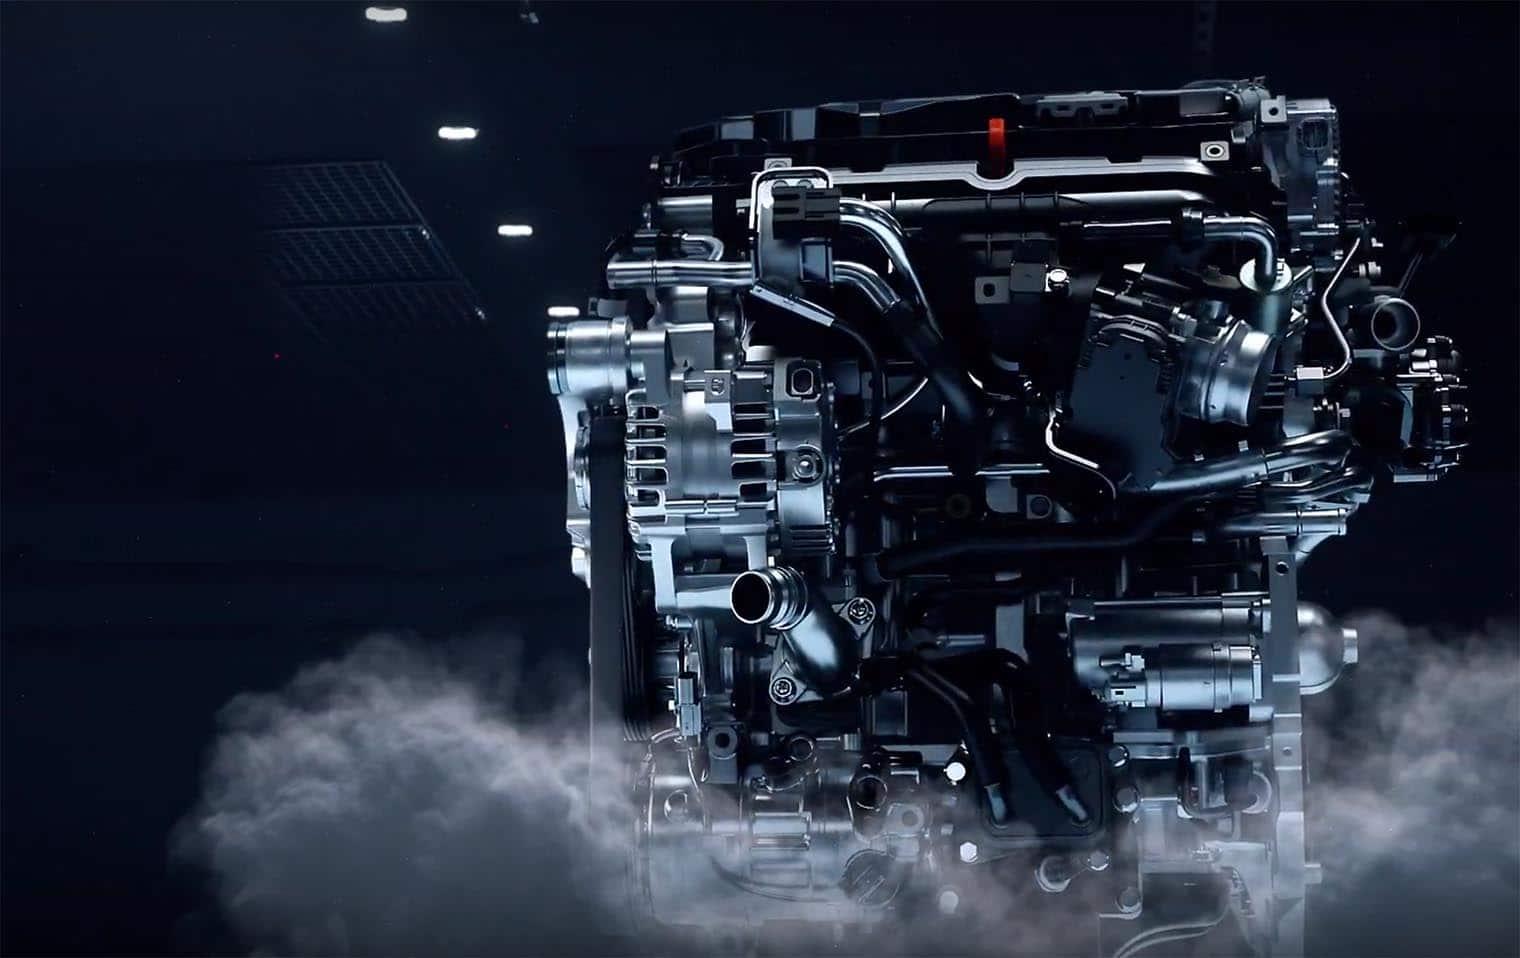 Hyundai Claims CVVD Engine Tech Improves Performance While ...